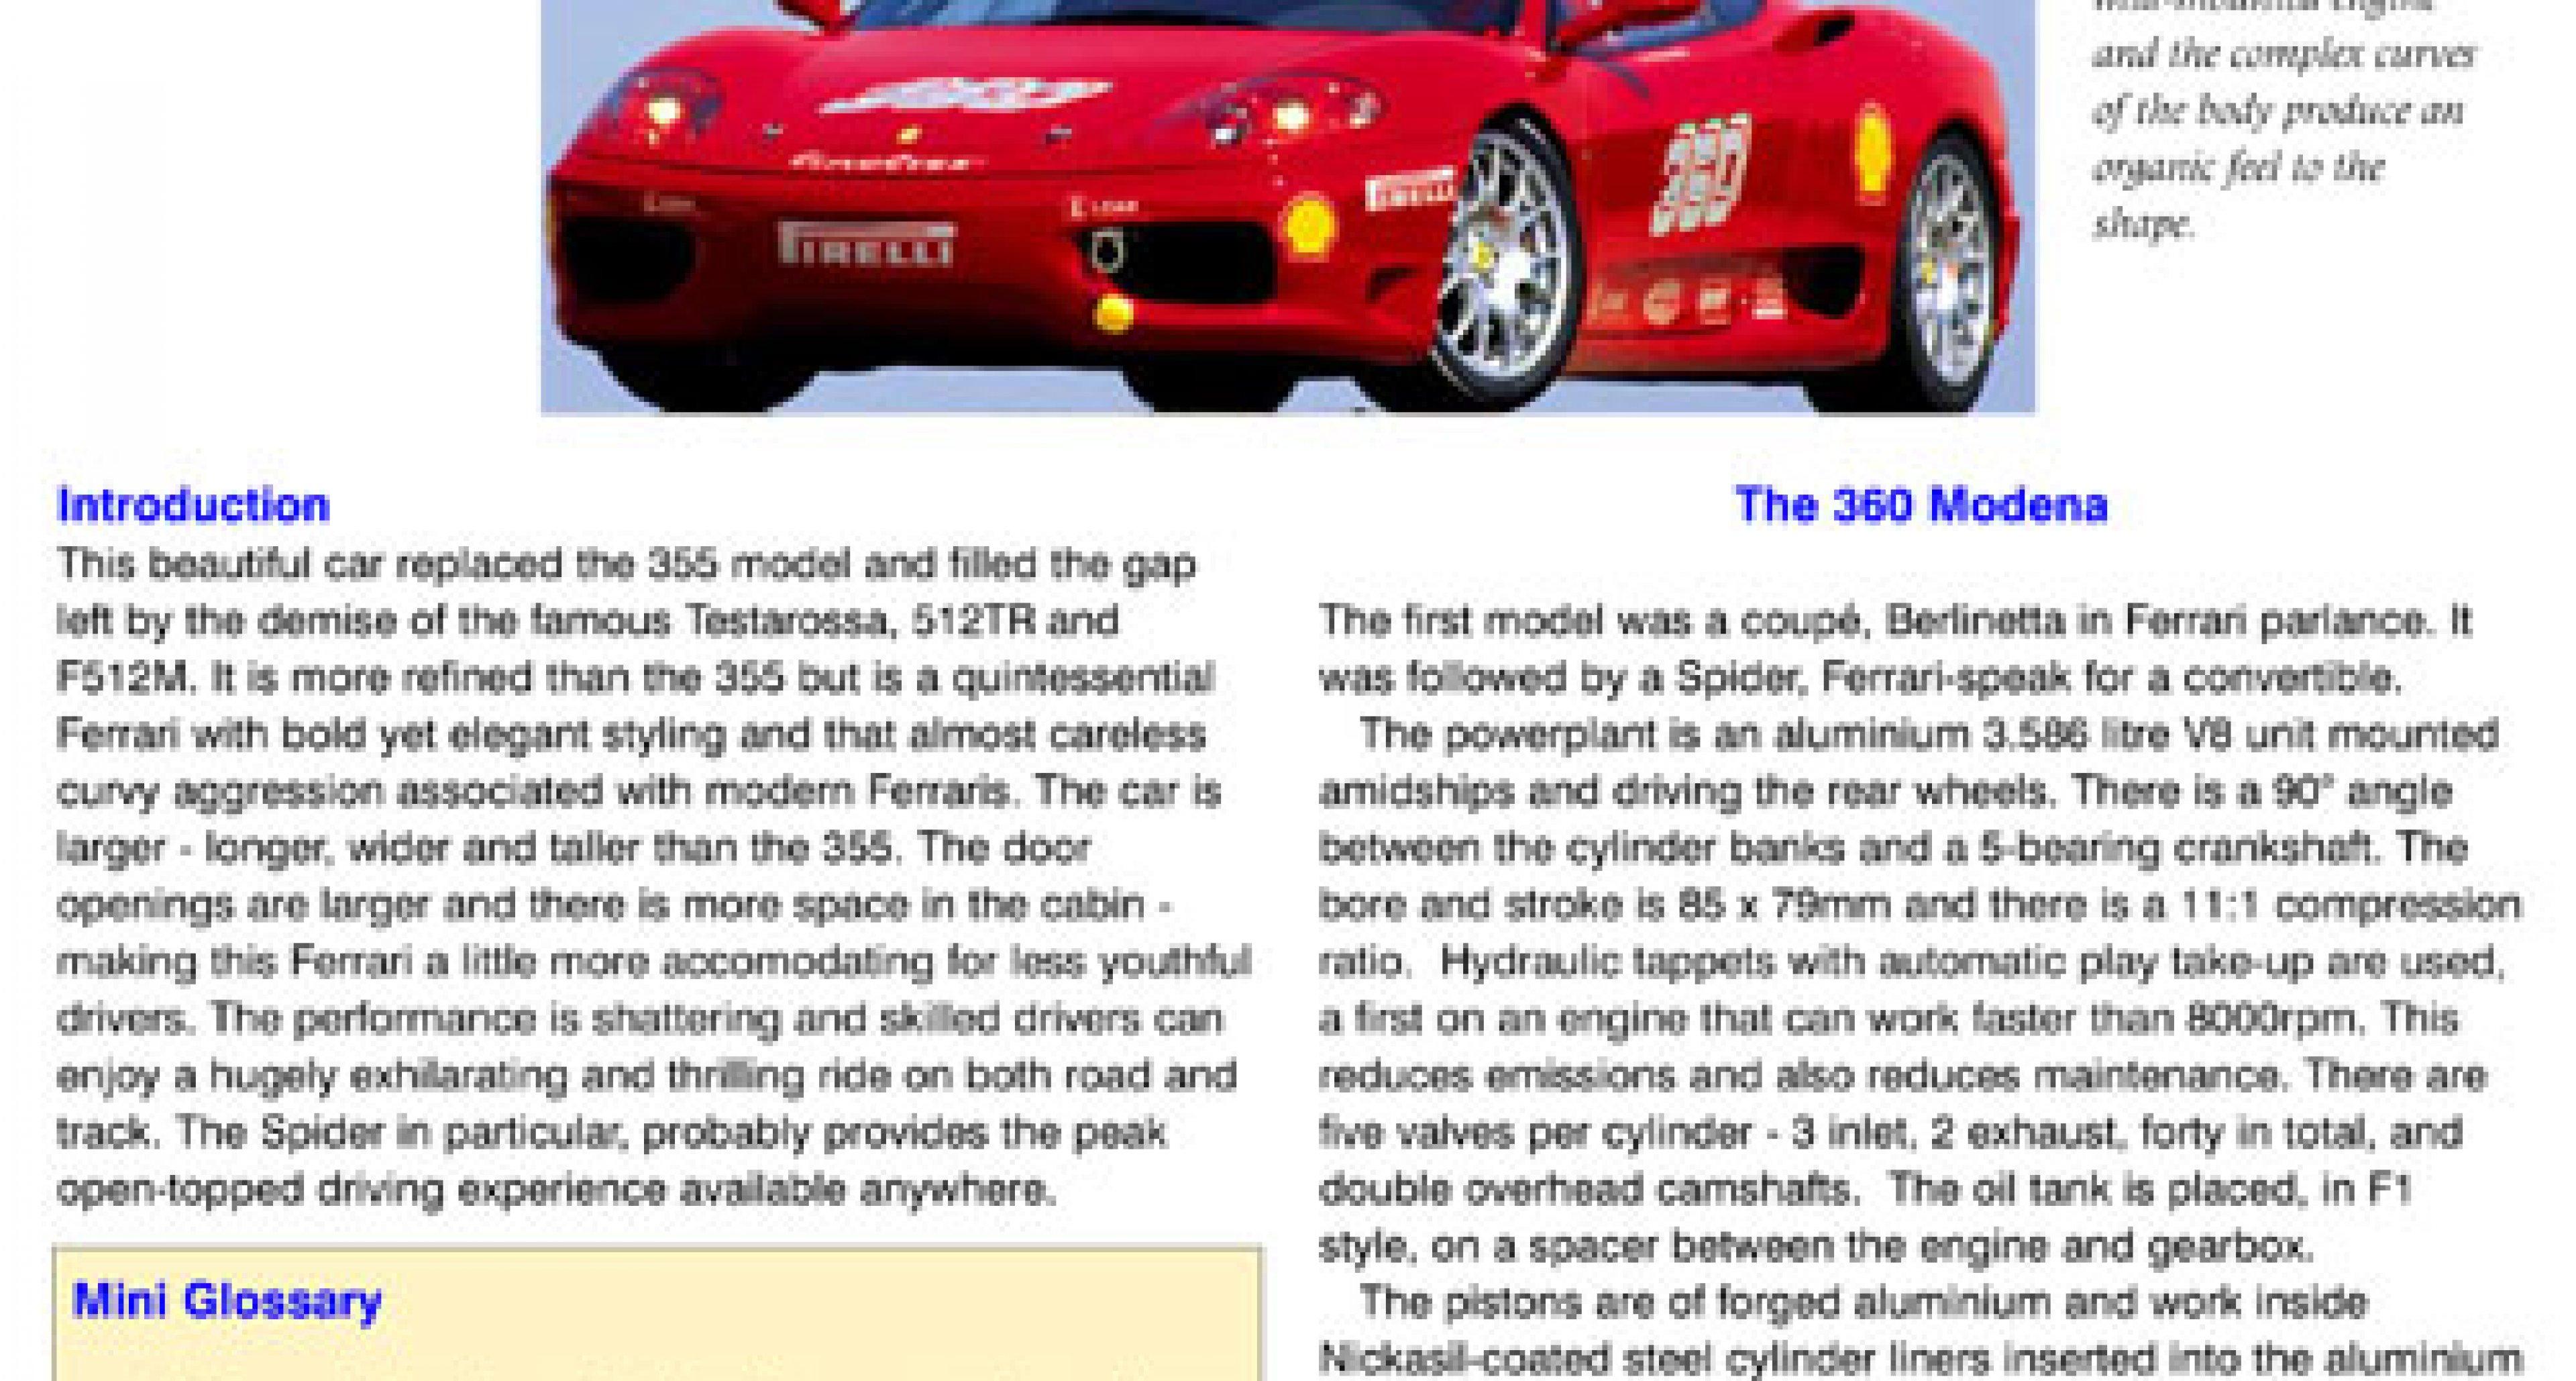 Ferrari Owners' Club of Great Britain & Sportscarguides.com launch unique new service